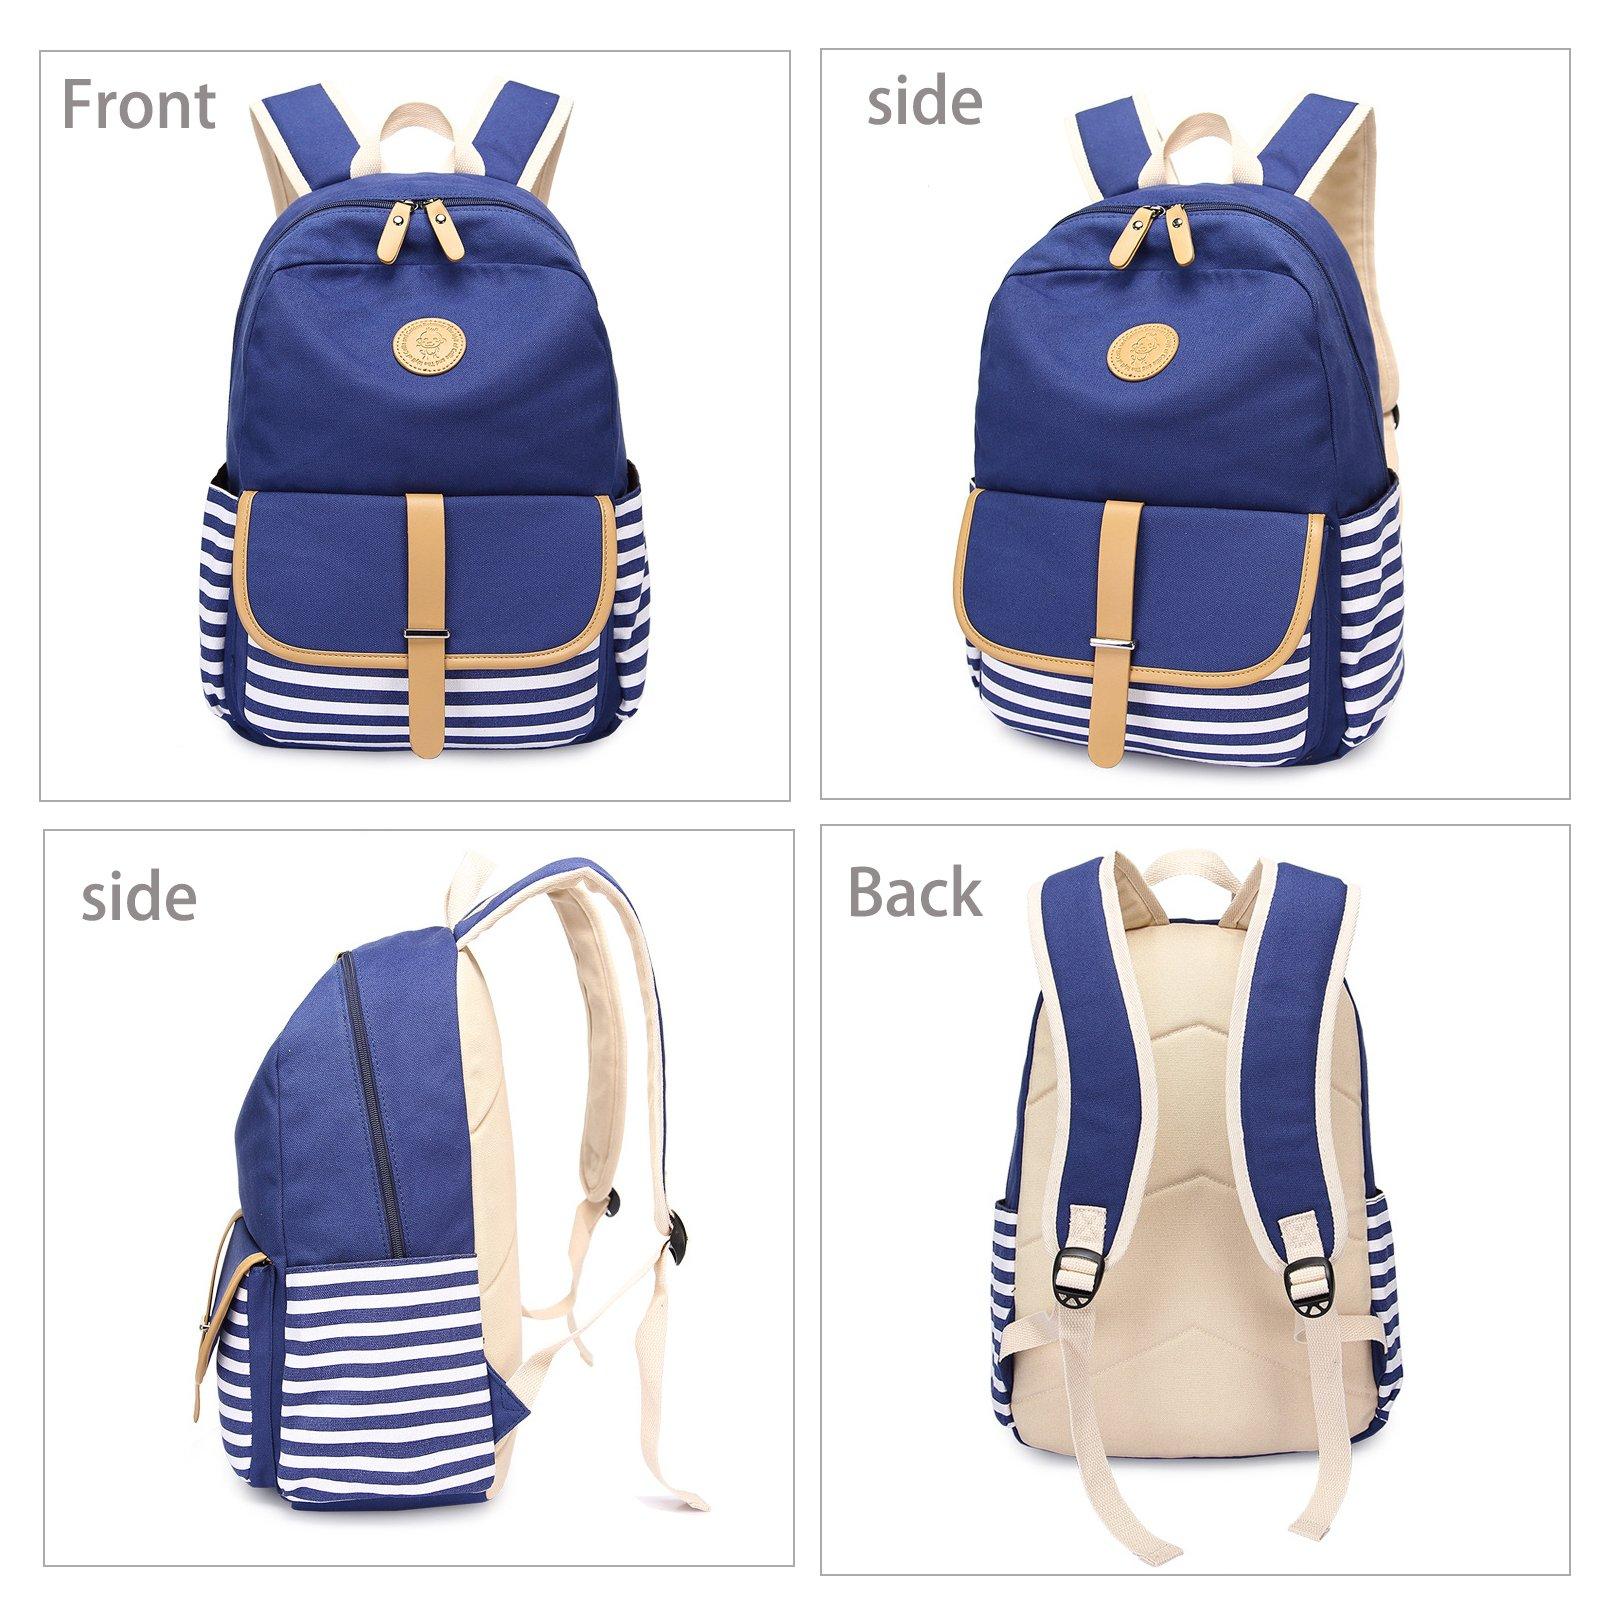 Abshoo Causal Travel Canvas Rucksack Backpacks for Girls School Bookbags (Navy) by abshoo (Image #2)